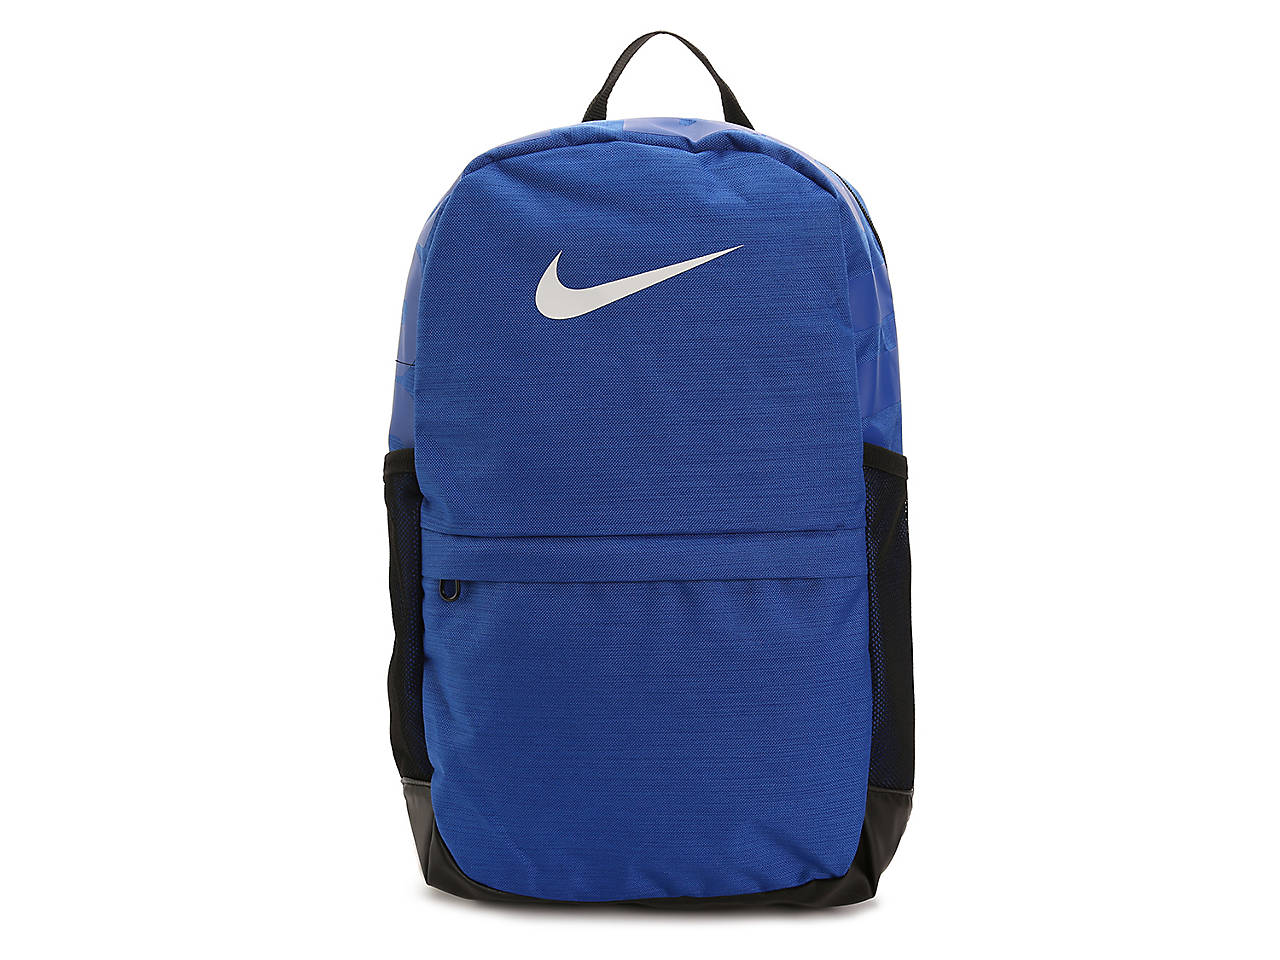 5269f4b444 Nike Brasilia Backpack Men s Handbags   Accessories